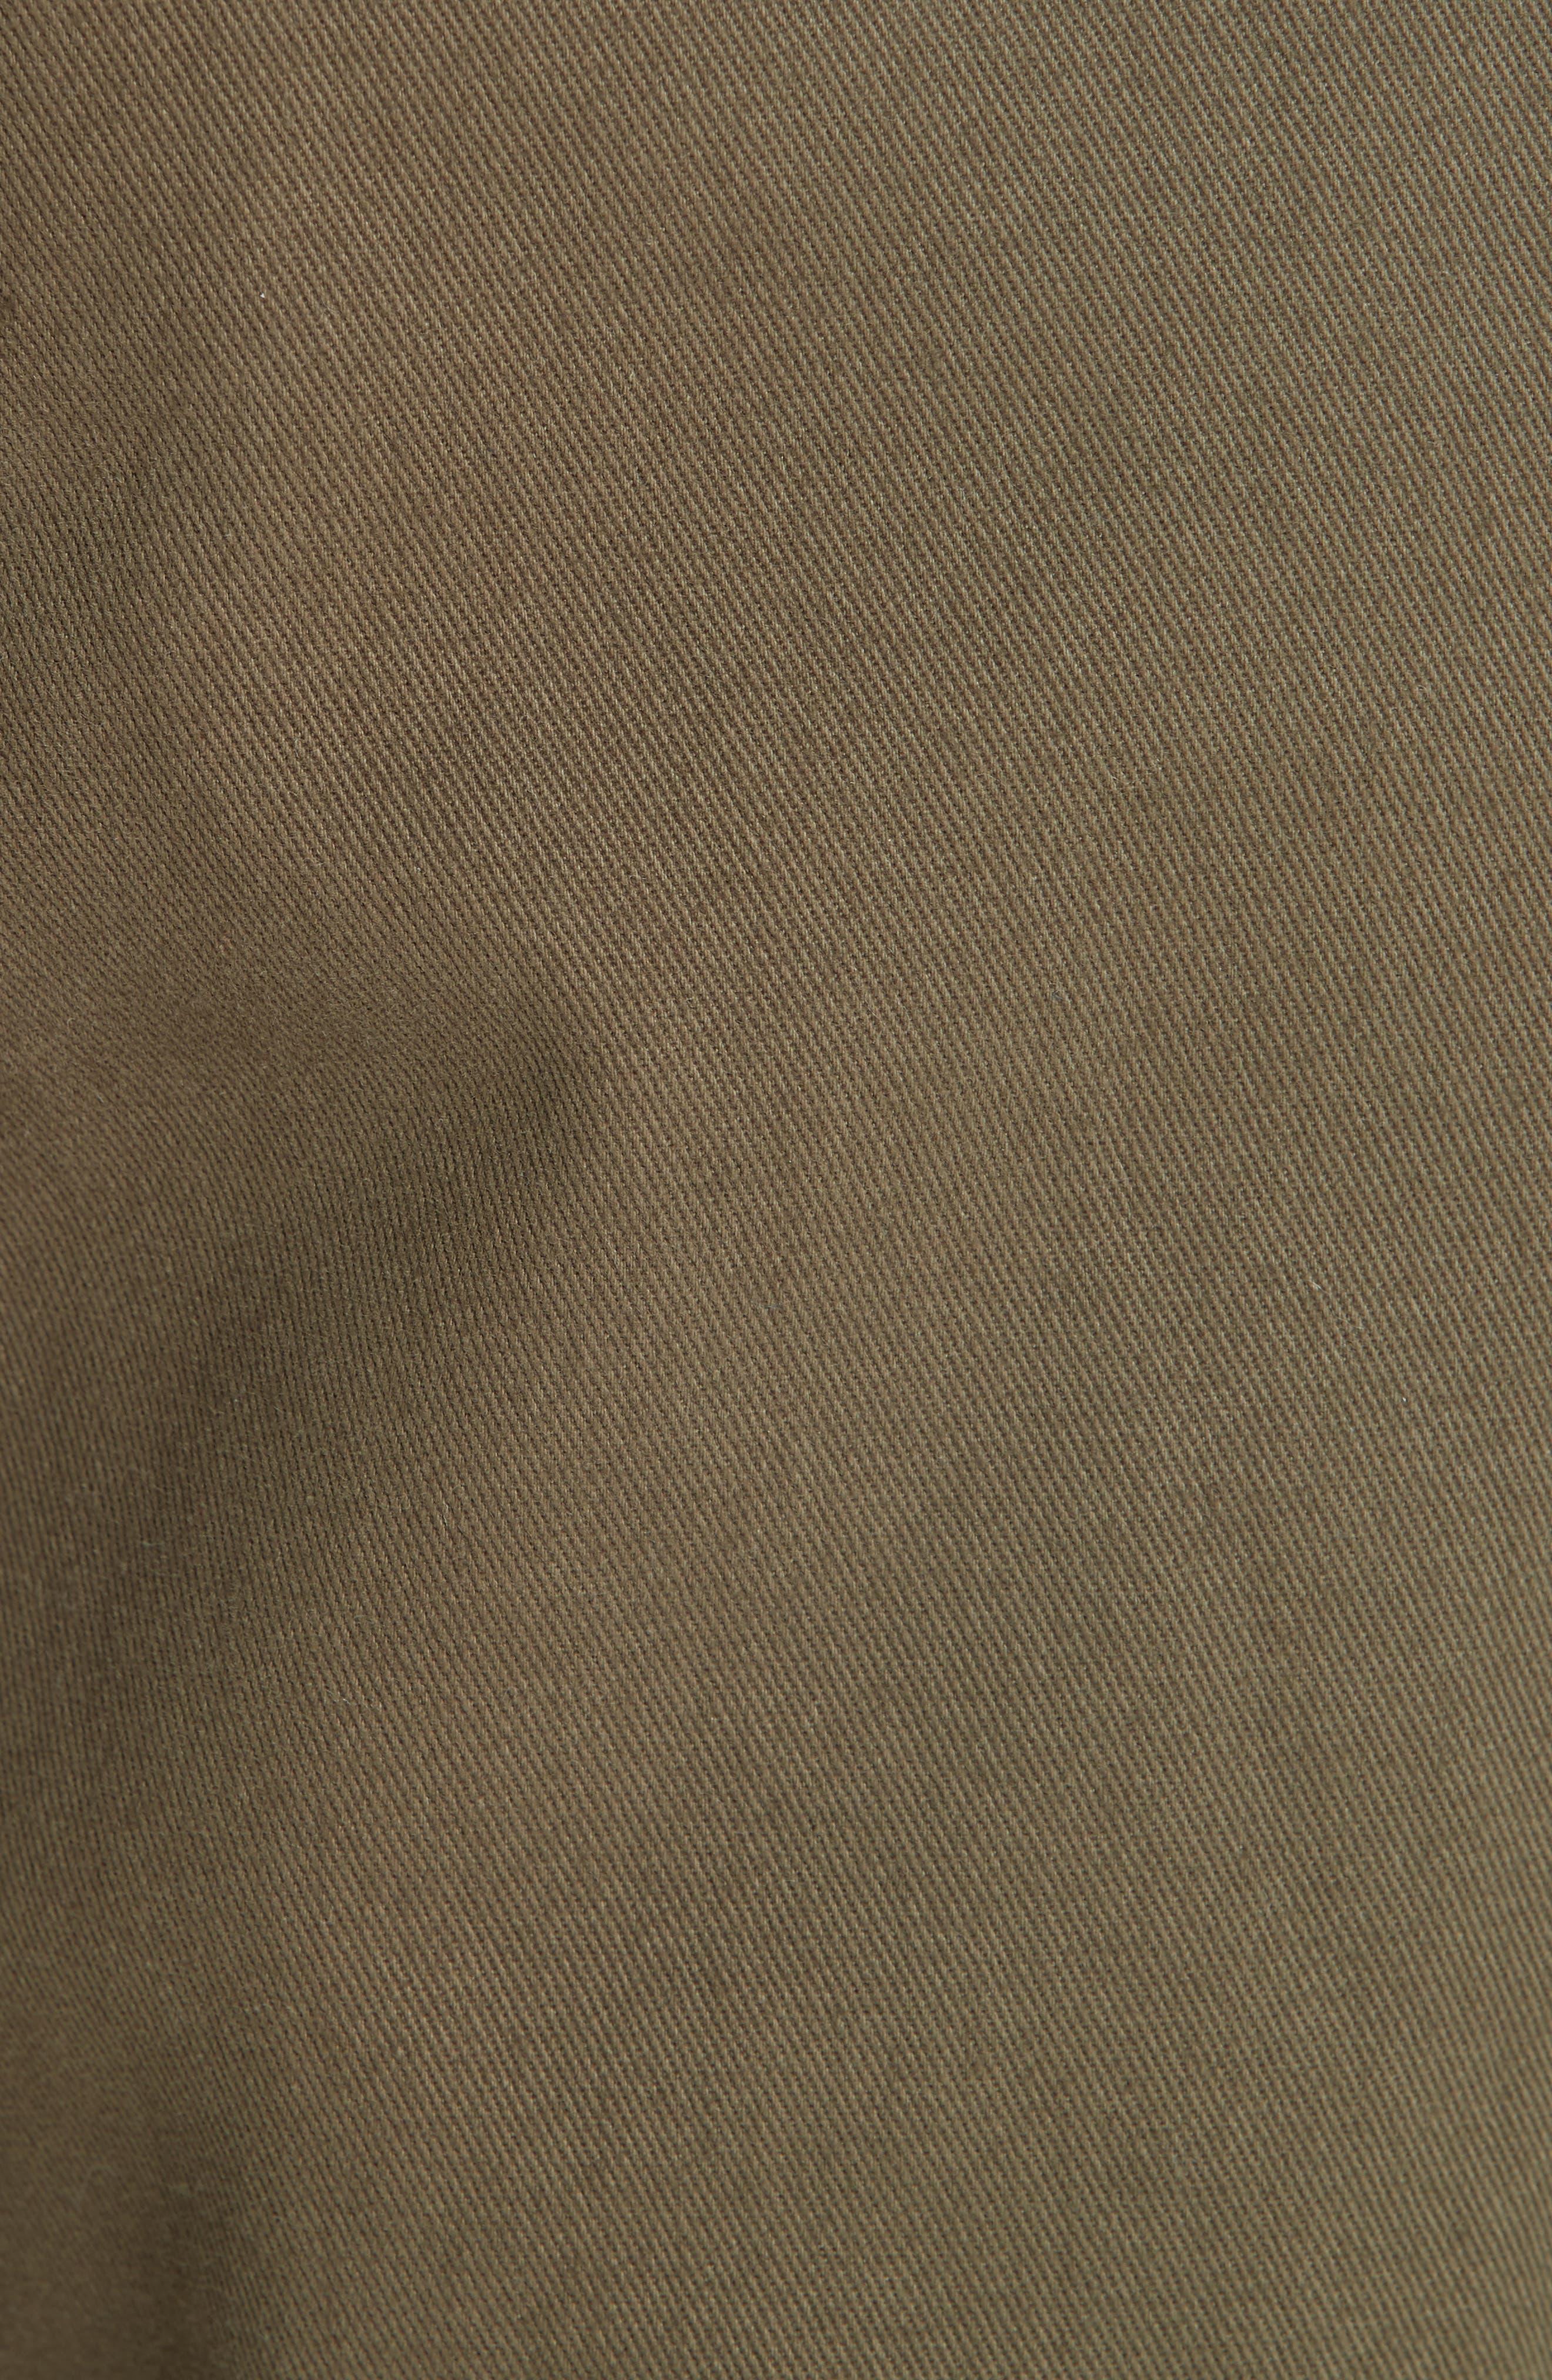 Storm Utility Cargo Pants,                             Alternate thumbnail 5, color,                             OLIVE